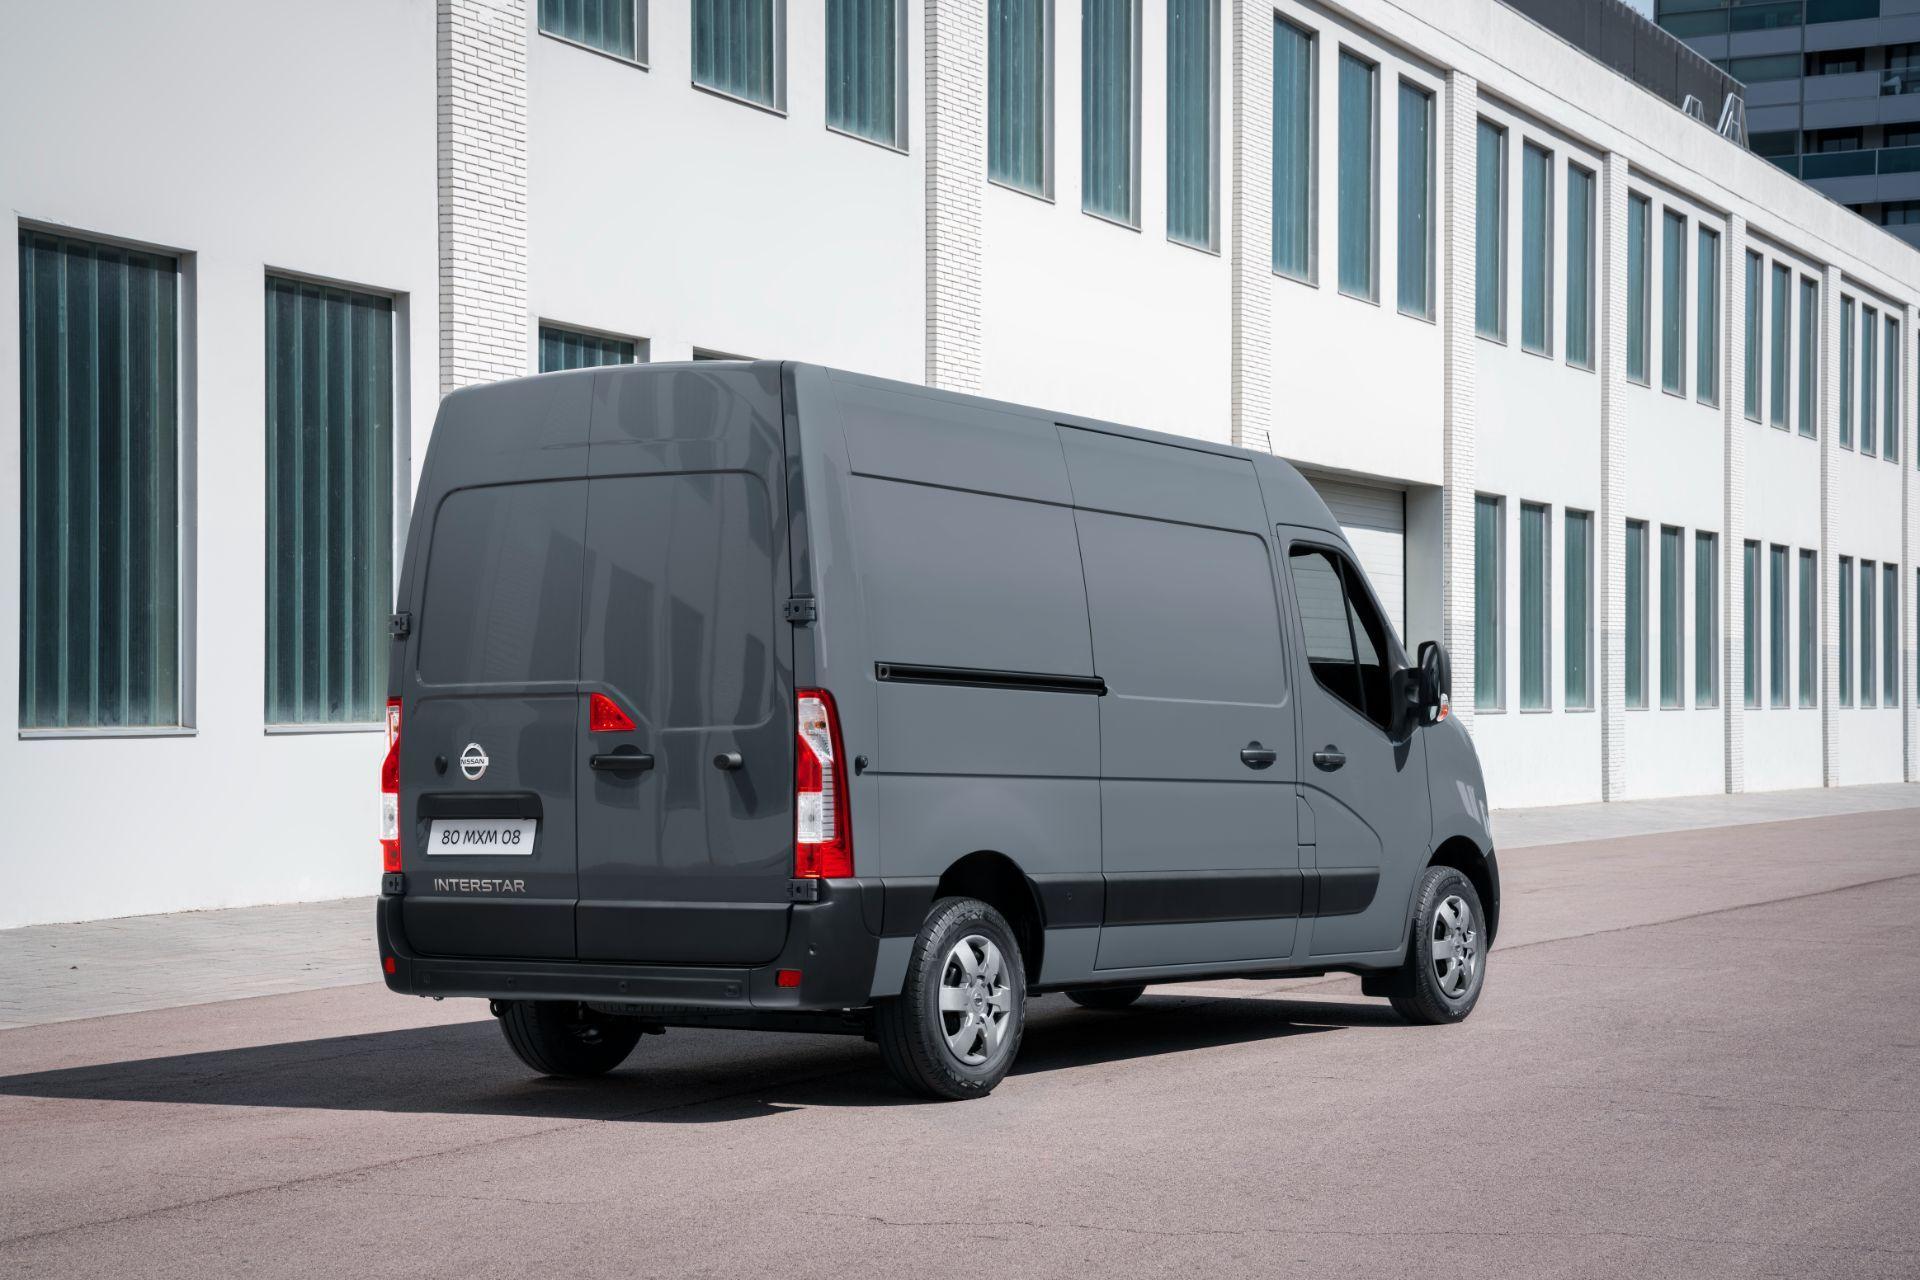 2022-Nissan-Interstar-Van-4